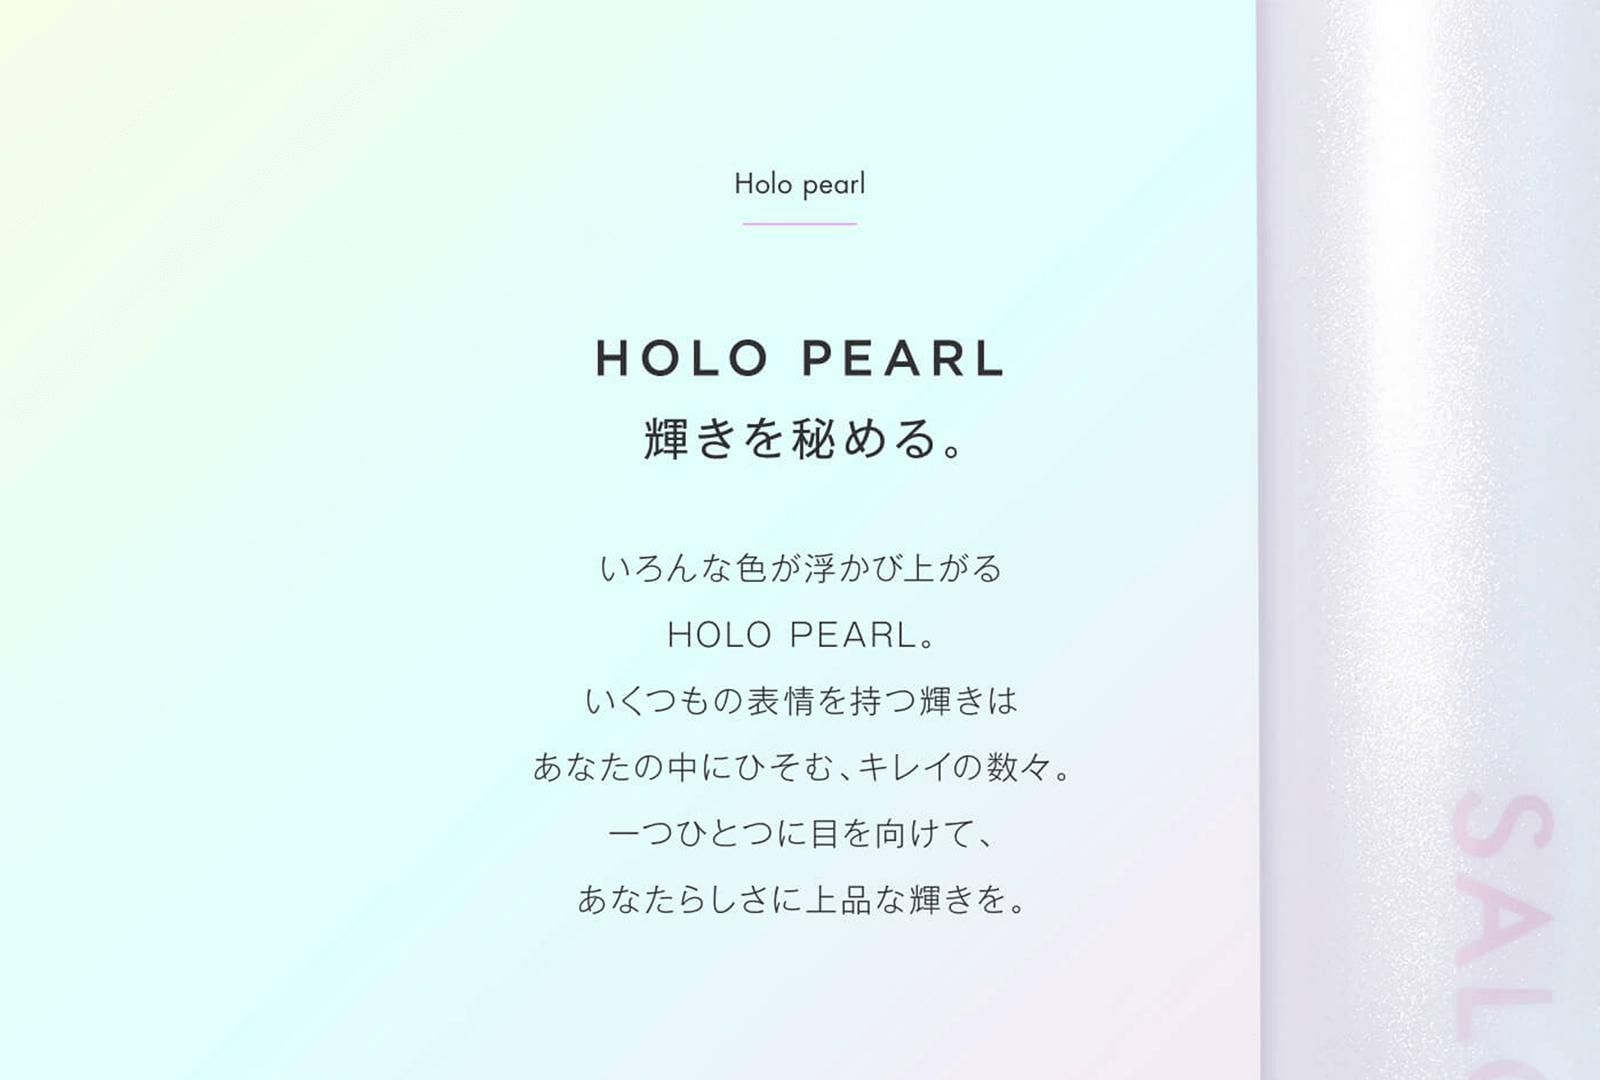 I-ne「SALONIA ヘアアイロン HOLO PEARL」ランディングページ